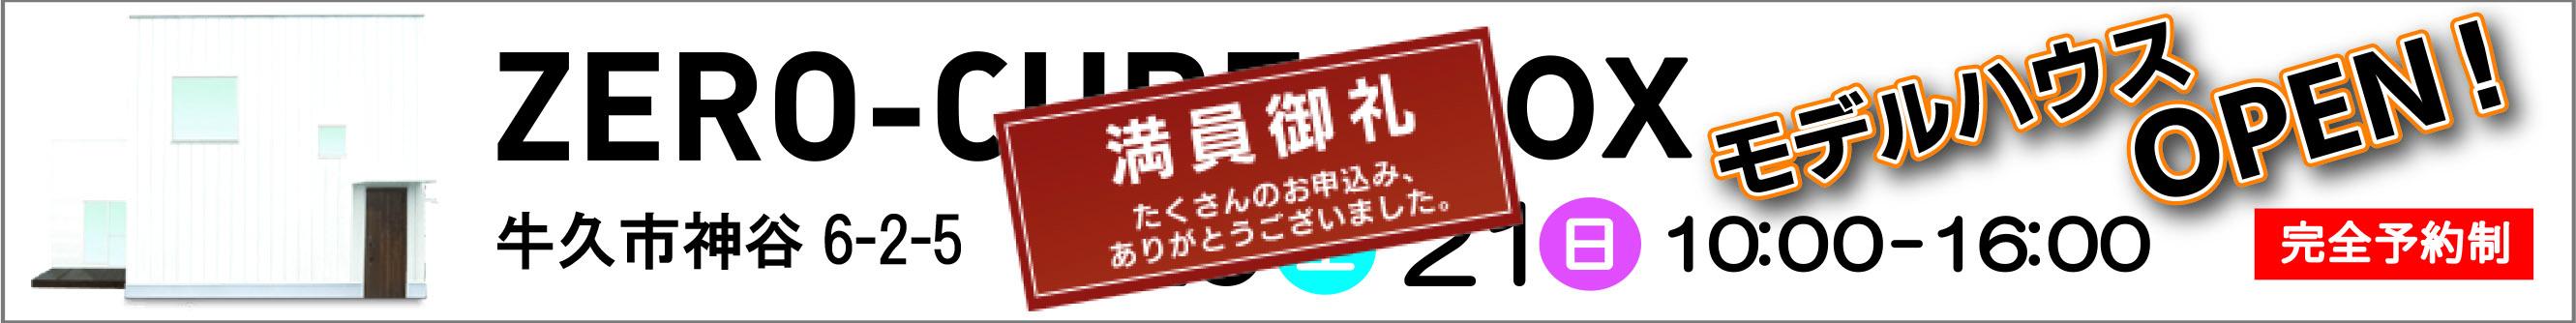 ZERO-CUBE+BOXモデルハウスOPEN!